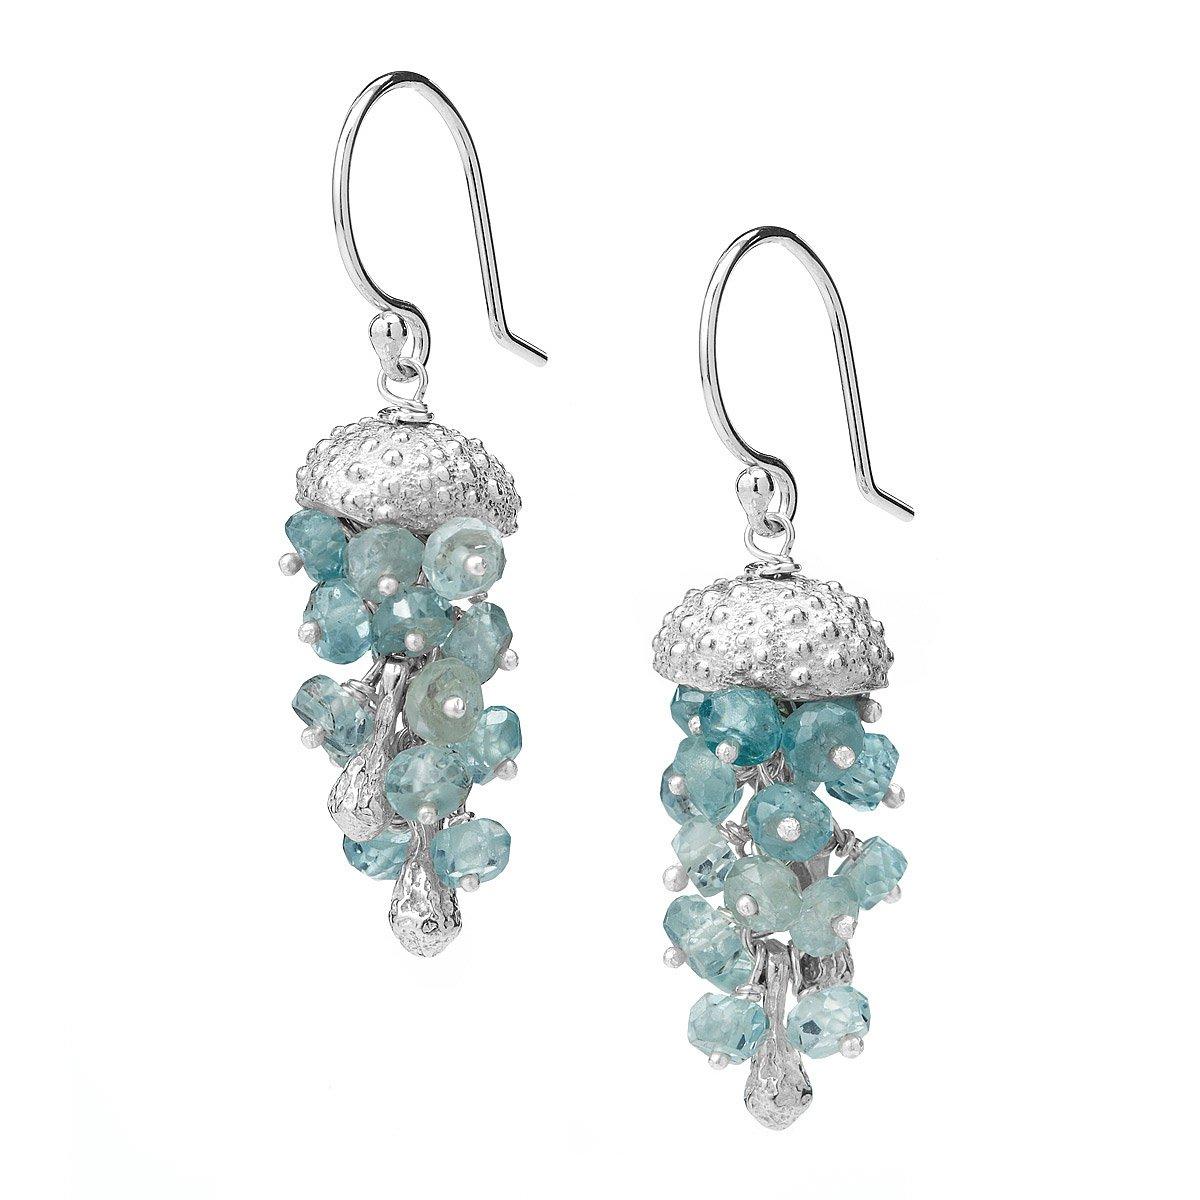 Jellyfish Earrings Silver Jewelry Sea Urchin Fish